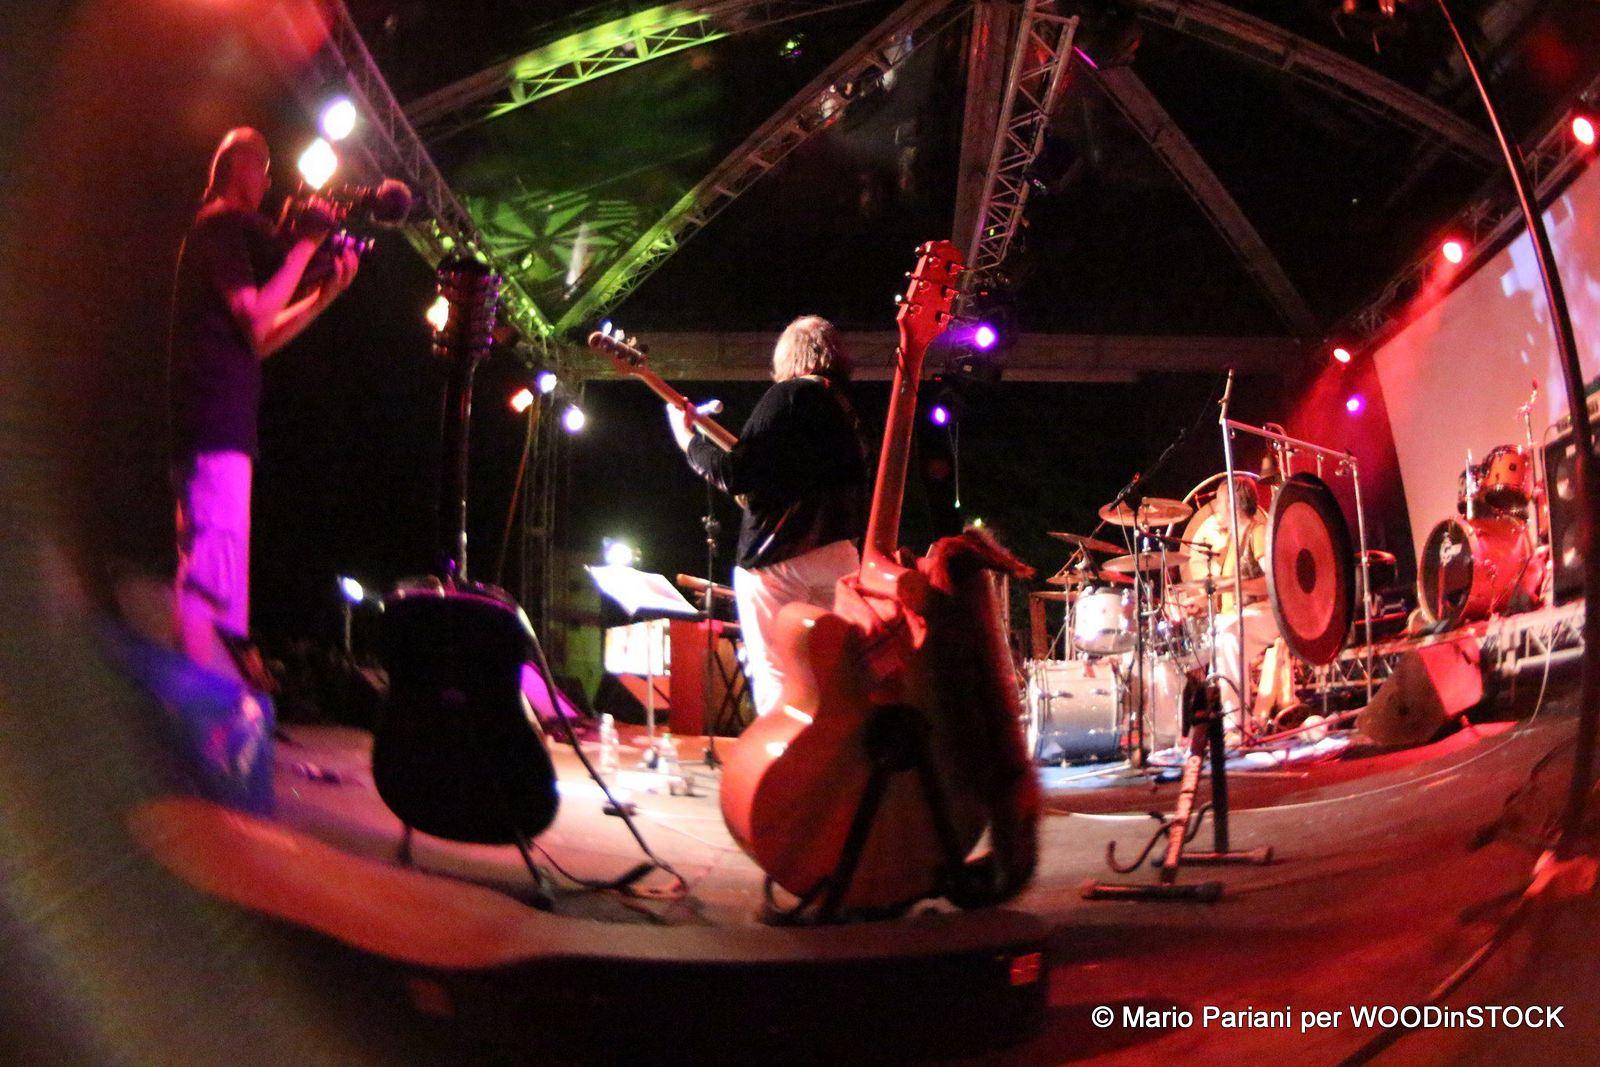 WOODinSTOCK 2013 © Mario Pariani